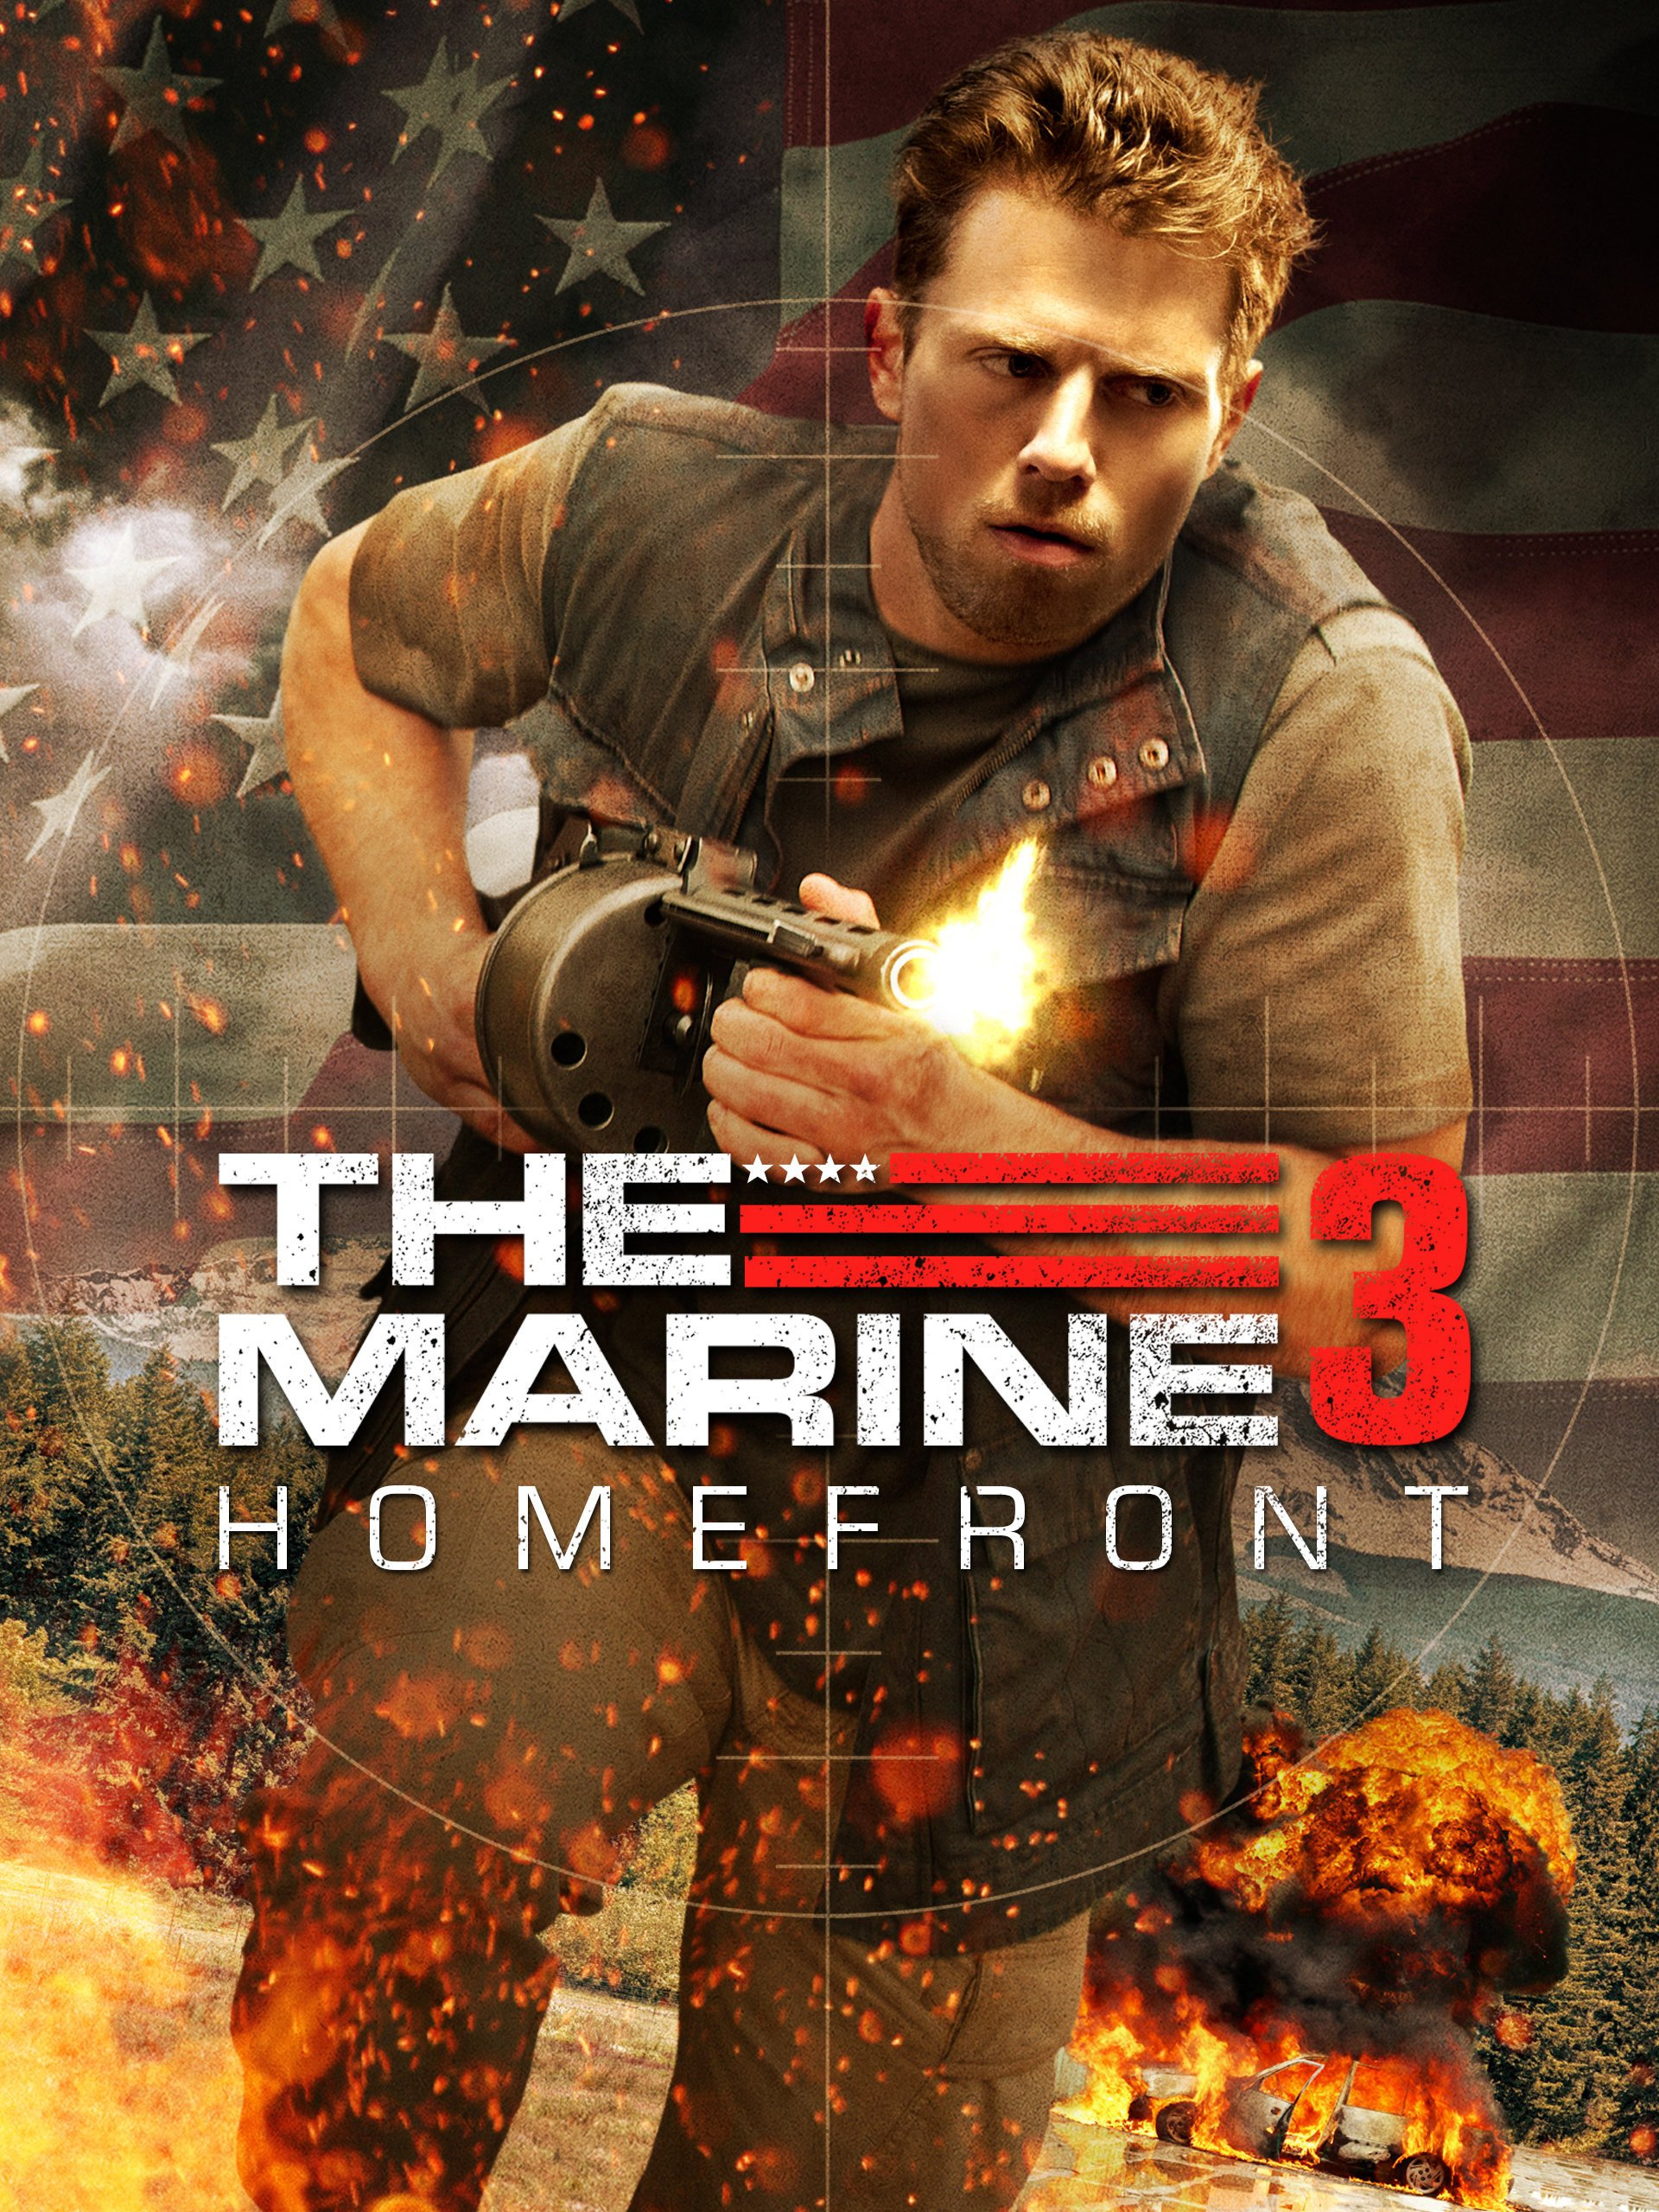 Amazon.de The Marine 20 Homefront ansehen   Prime Video